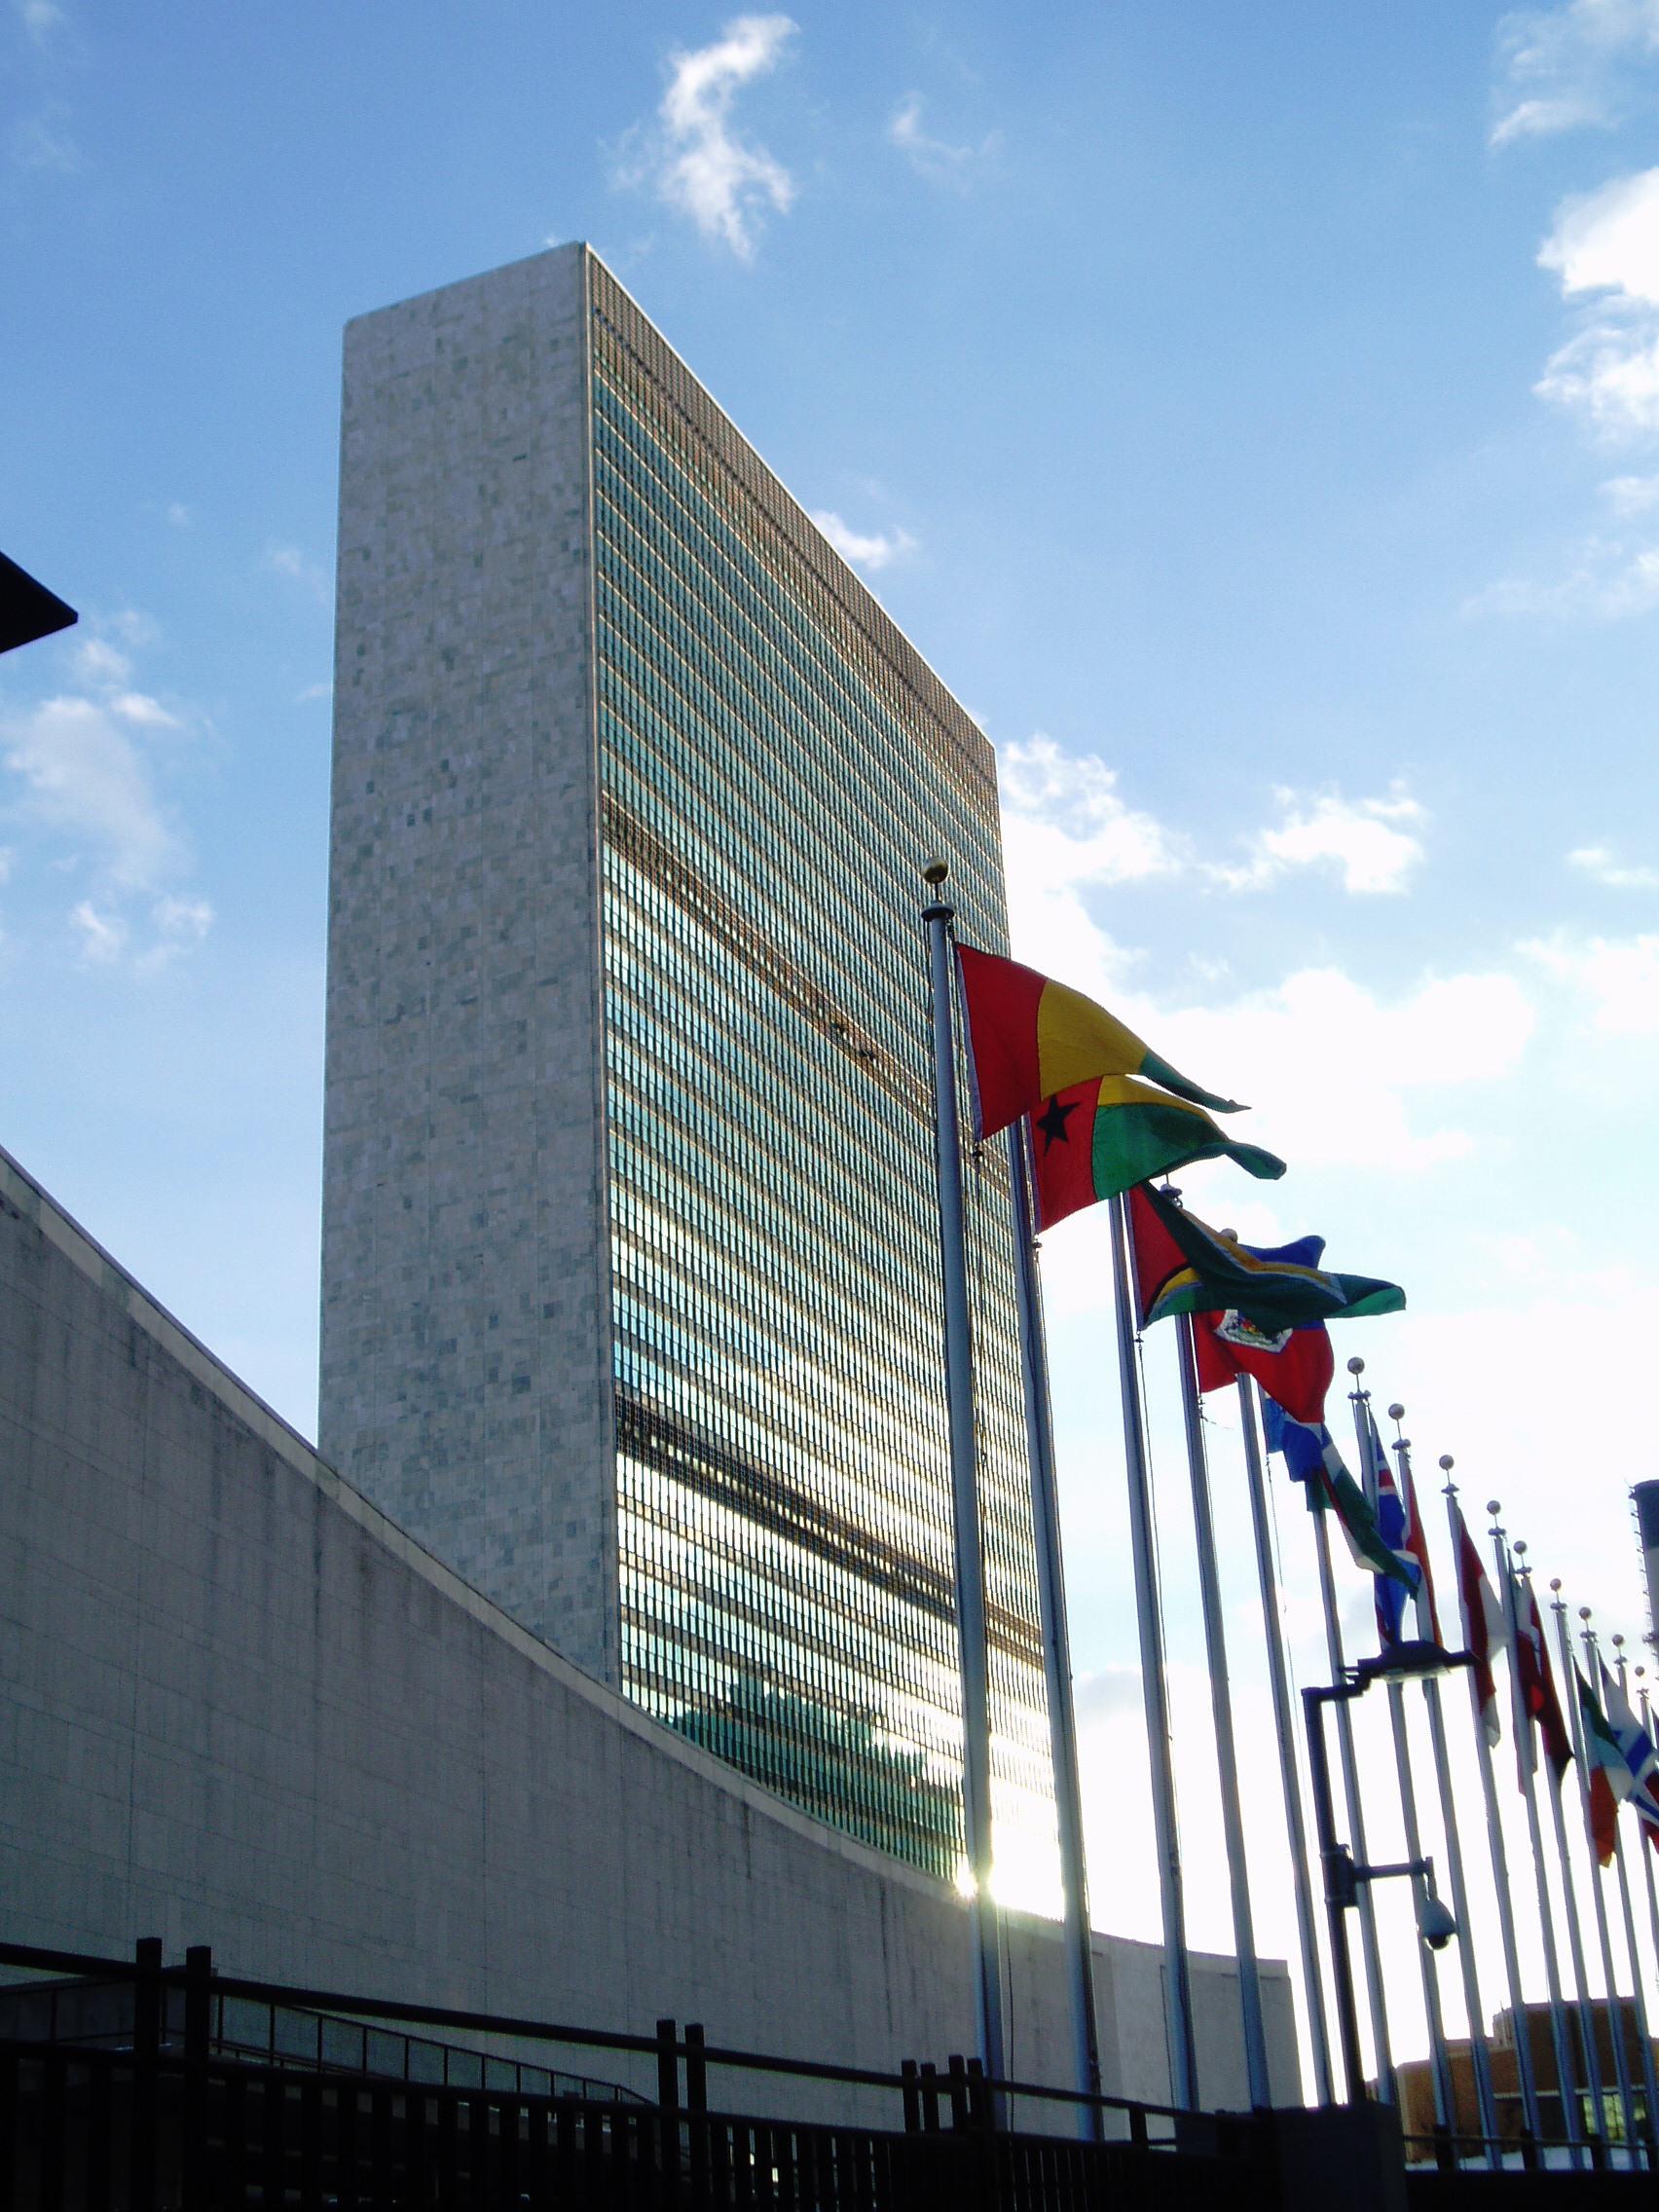 Russia wants to keep Ukraine off UN radar